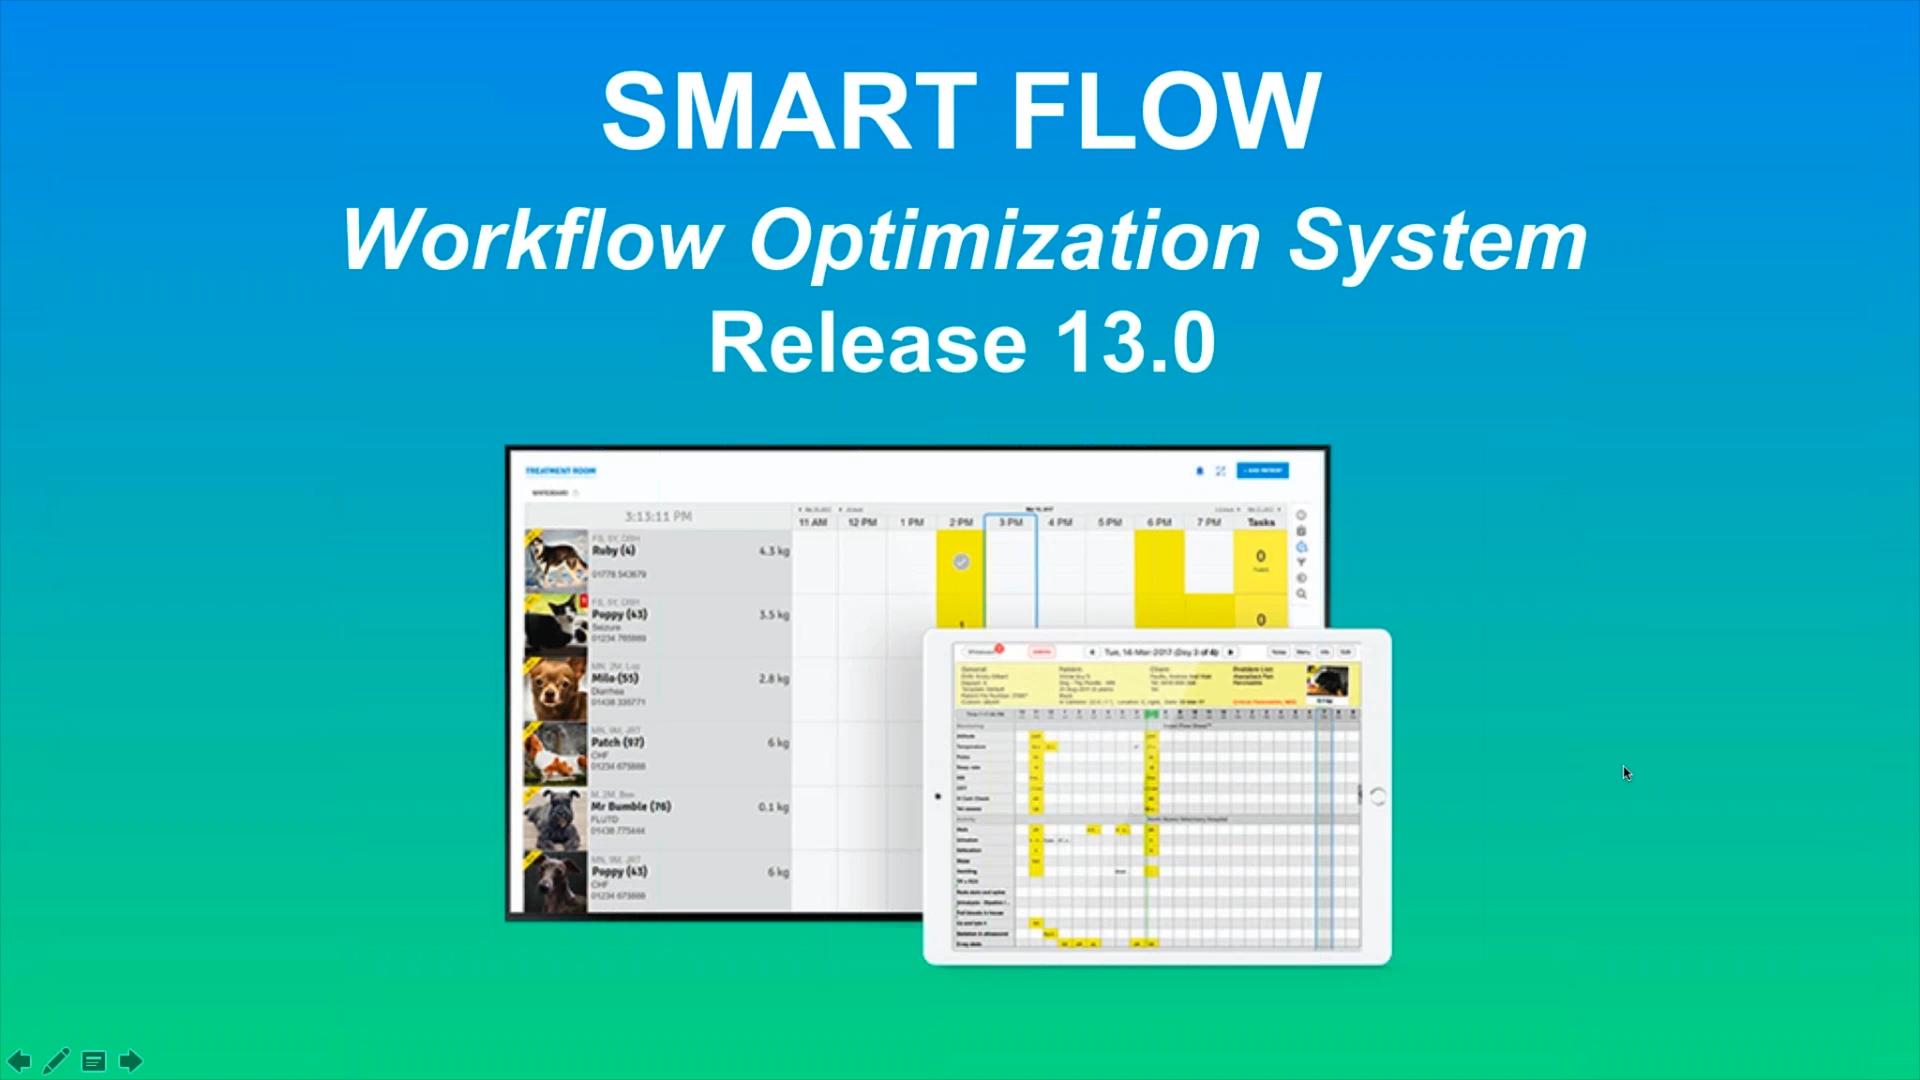 Webinar Recording: Smart Flow New Release 13.0 Coming Soon - 10/25/2017